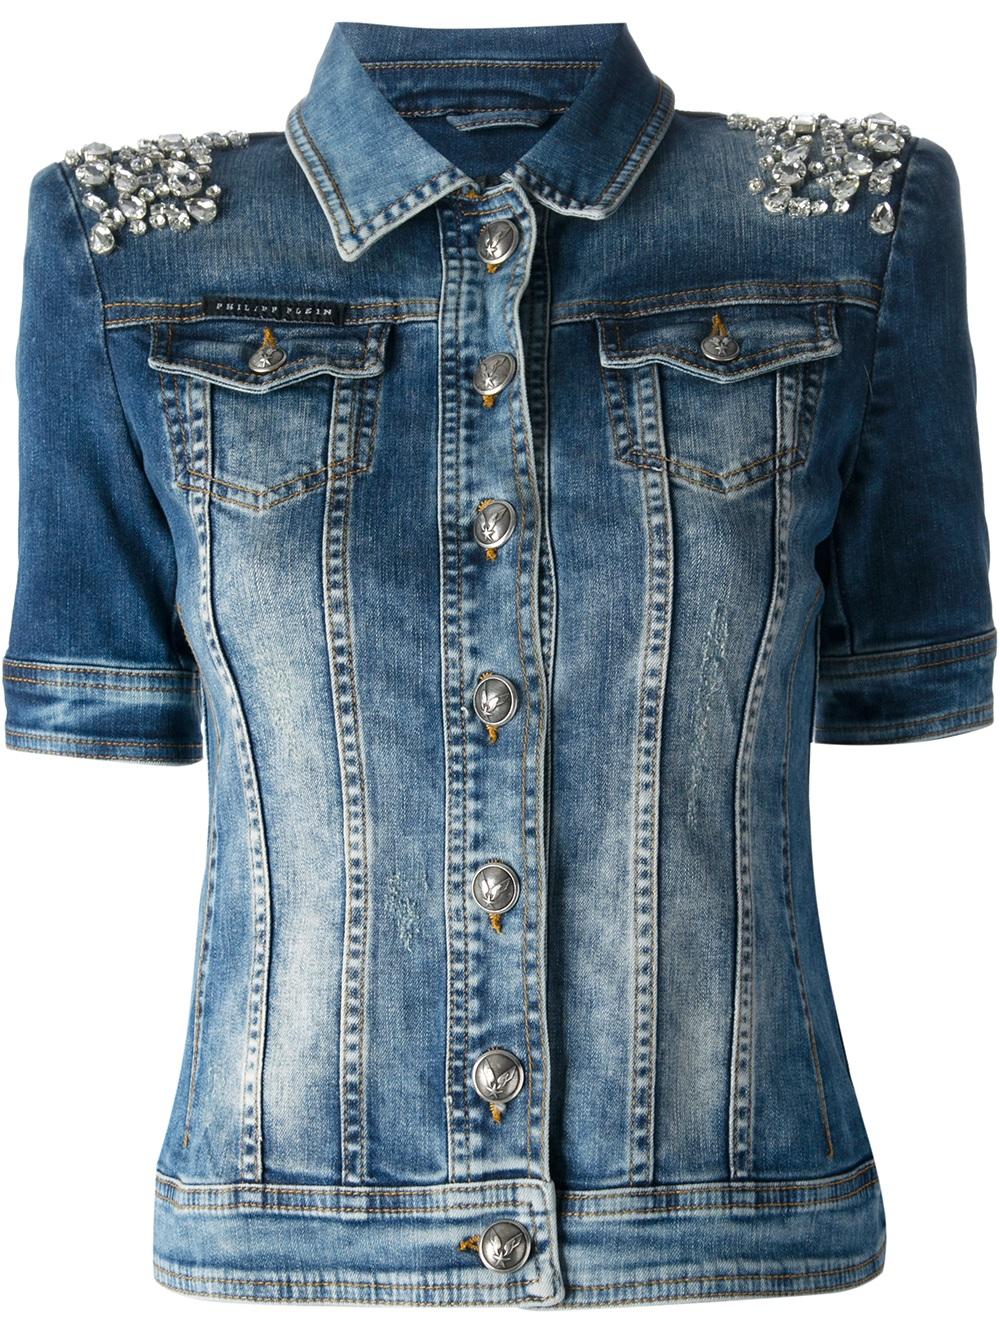 Philipp Plein Crystal Embellished Stretch Denim Jacket In